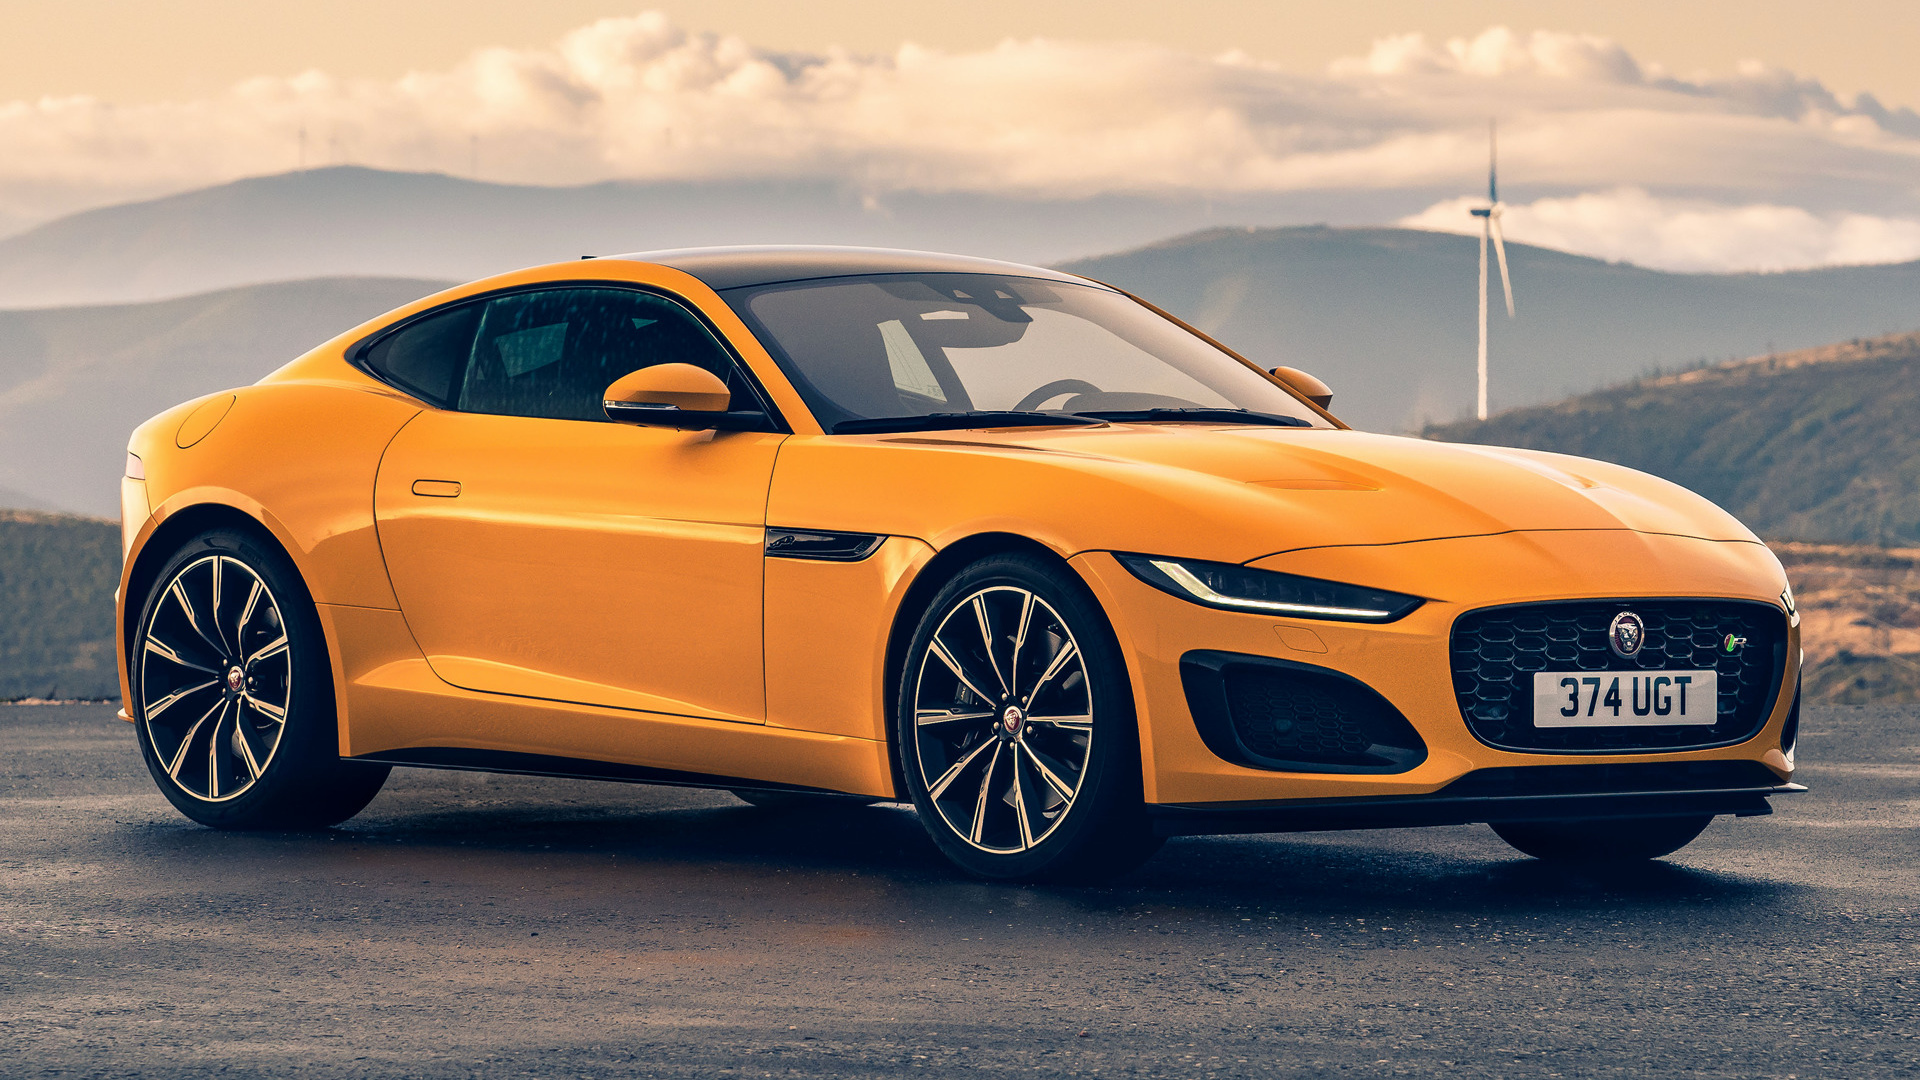 2020 jaguar f-type r coupe hd wallpaper | background image